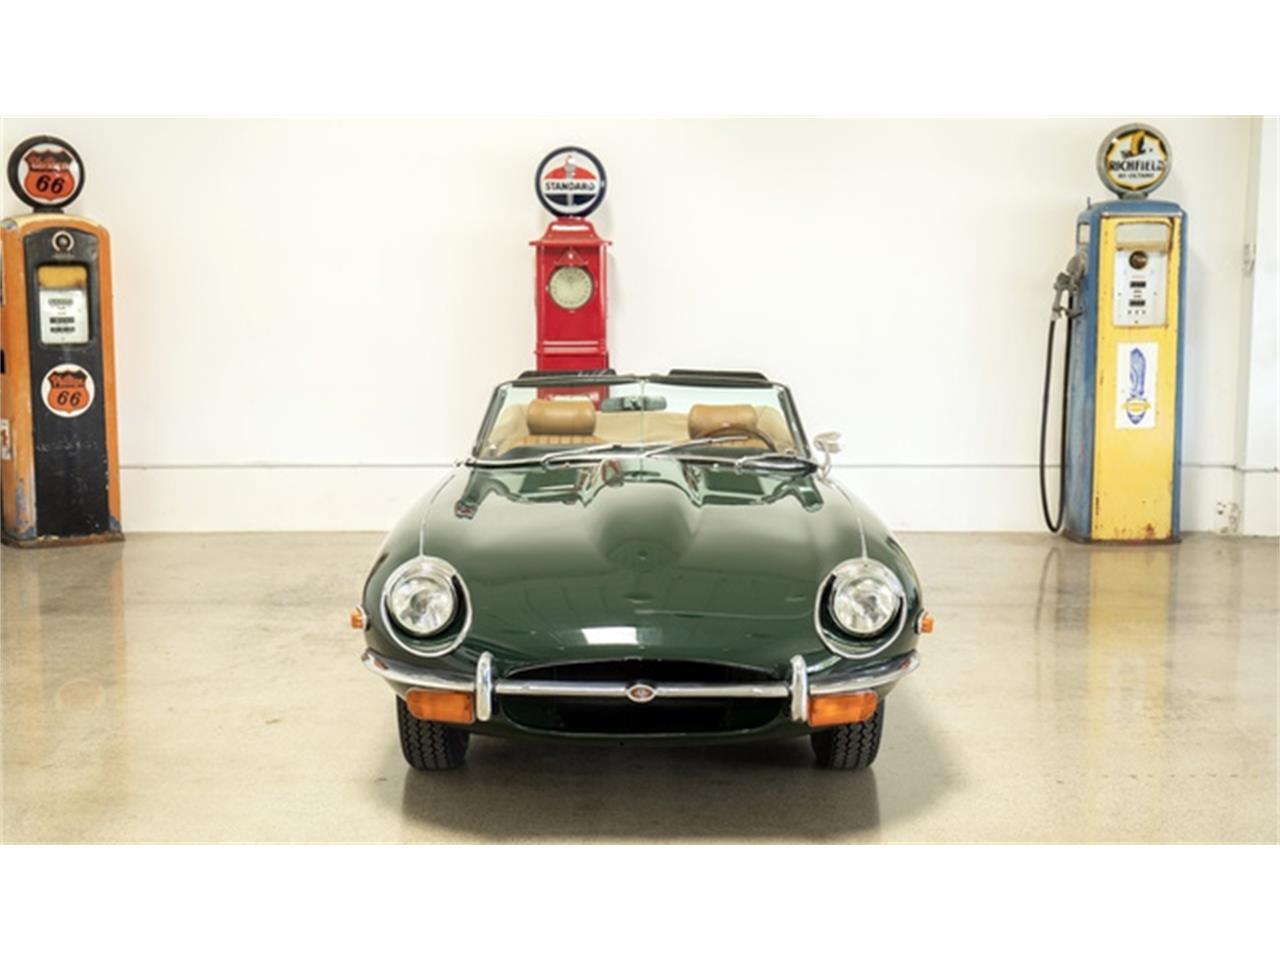 1969 Jaguar E-Type (CC-1213147) for sale in Pleasanton, California